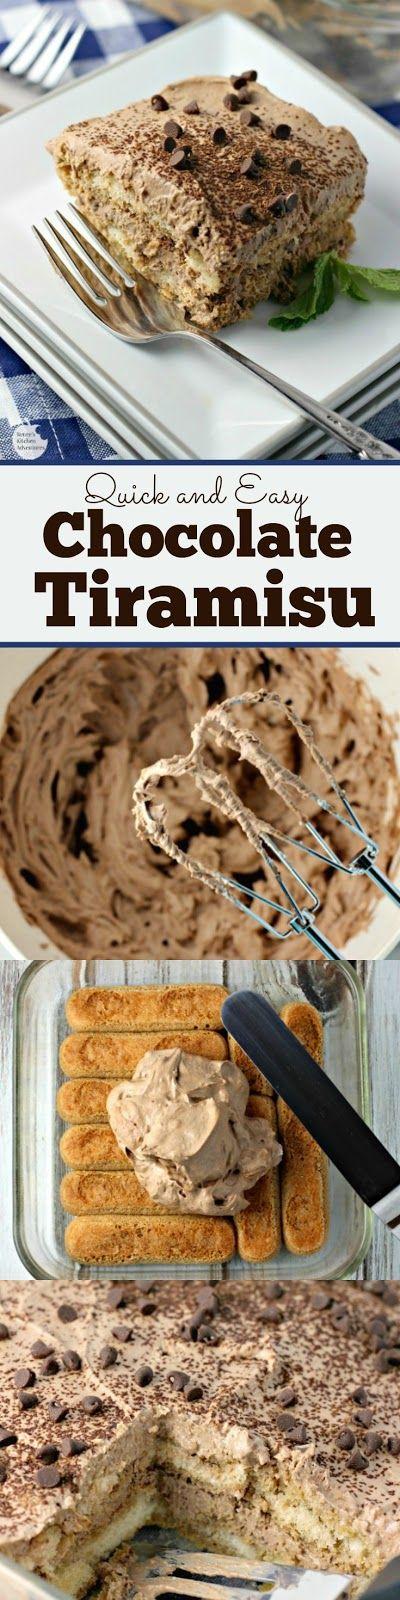 Chocolate tiramisu, Tiramisu and Easy desserts on Pinterest